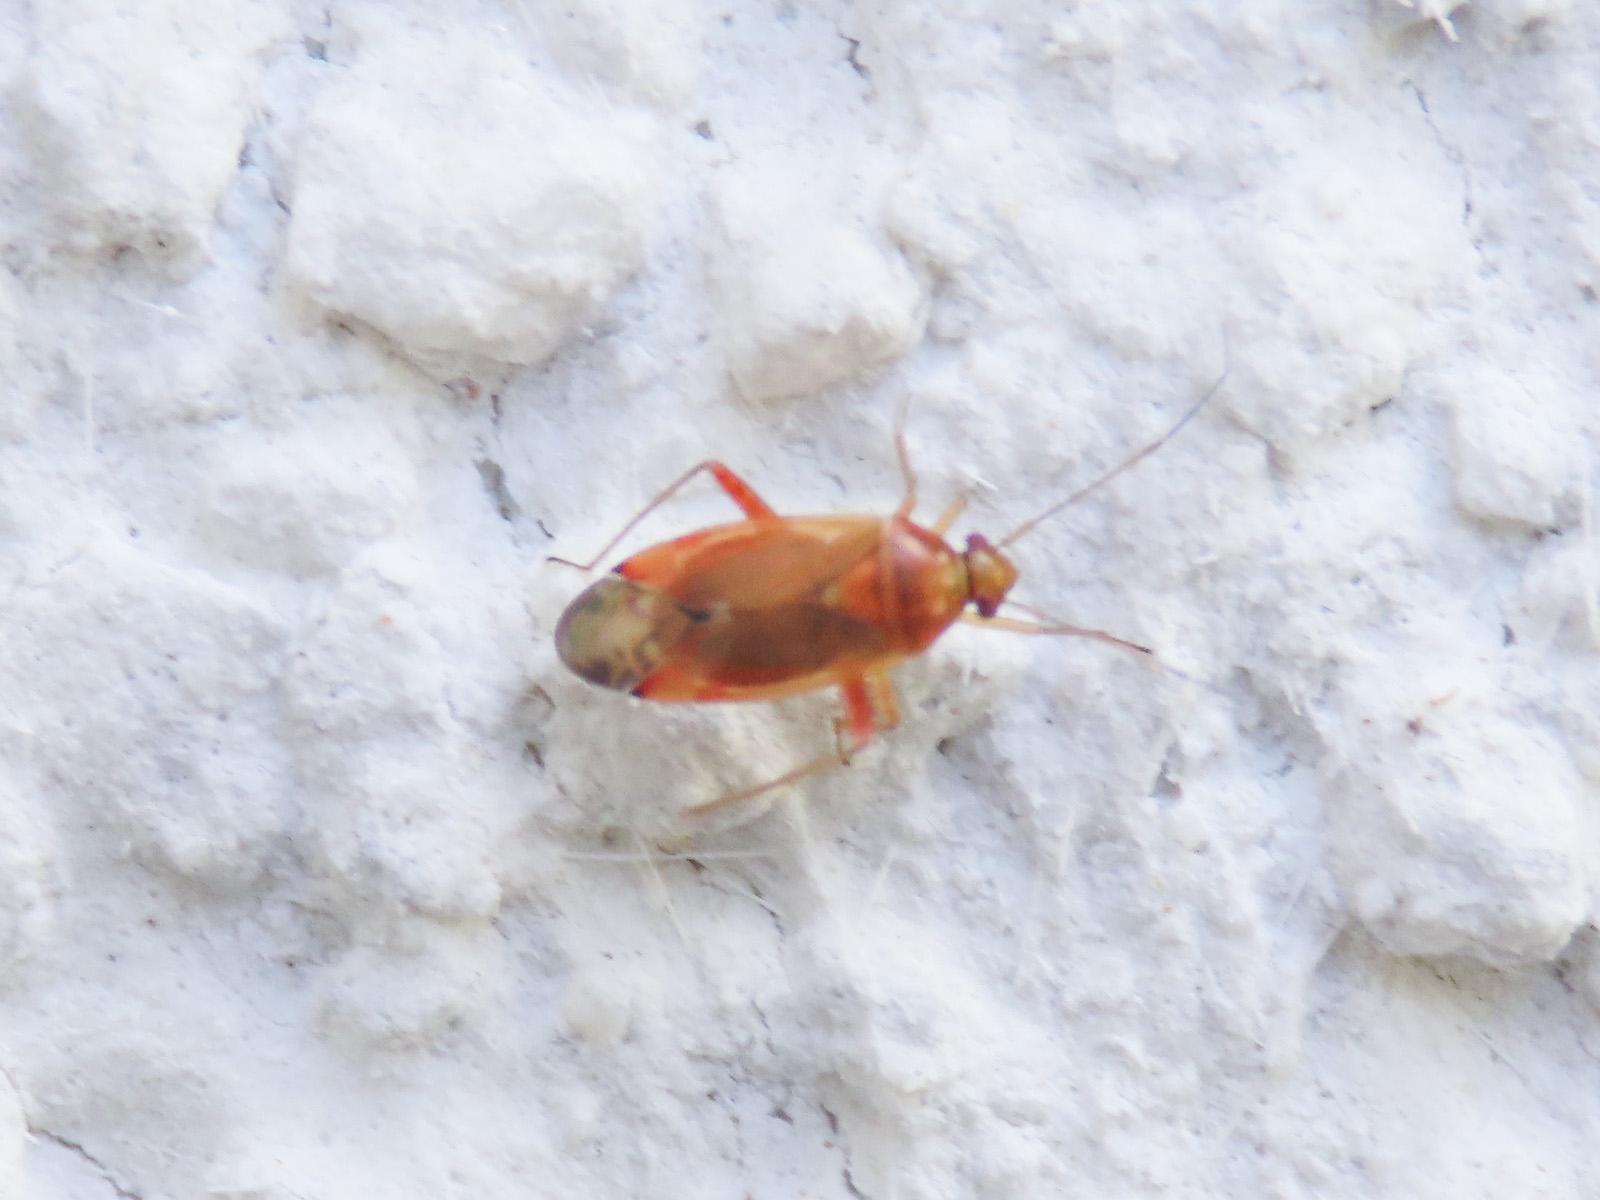 Miridae: Pinalitus rubricatus